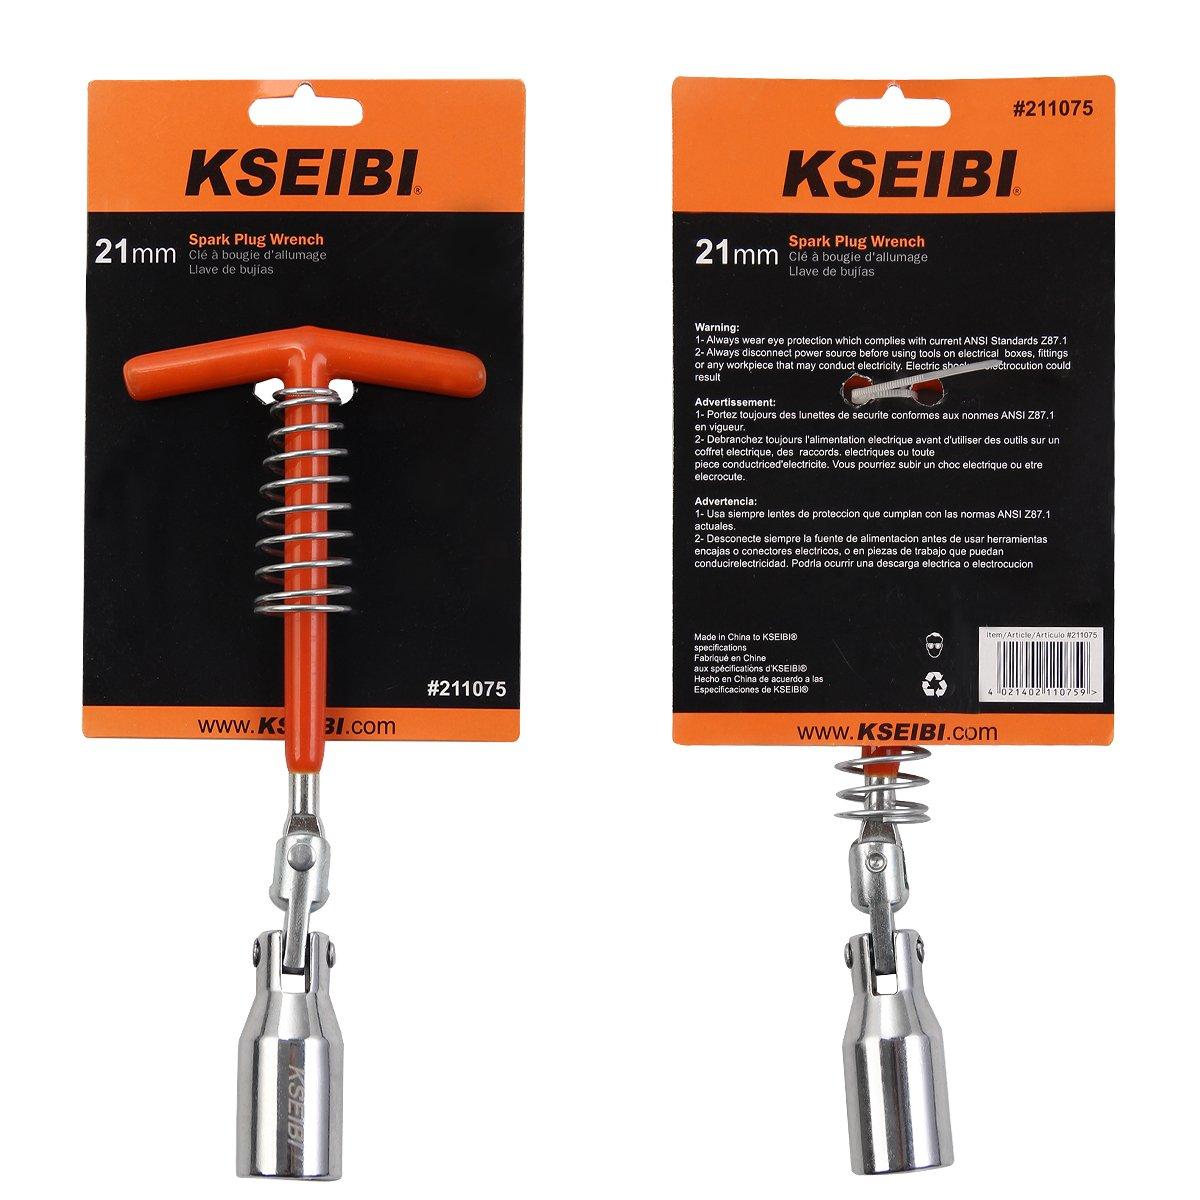 KSEIBI T-Handle Universal Joint Spark Plug Wrench Socket Remover Installer (21mm) - - Amazon.com